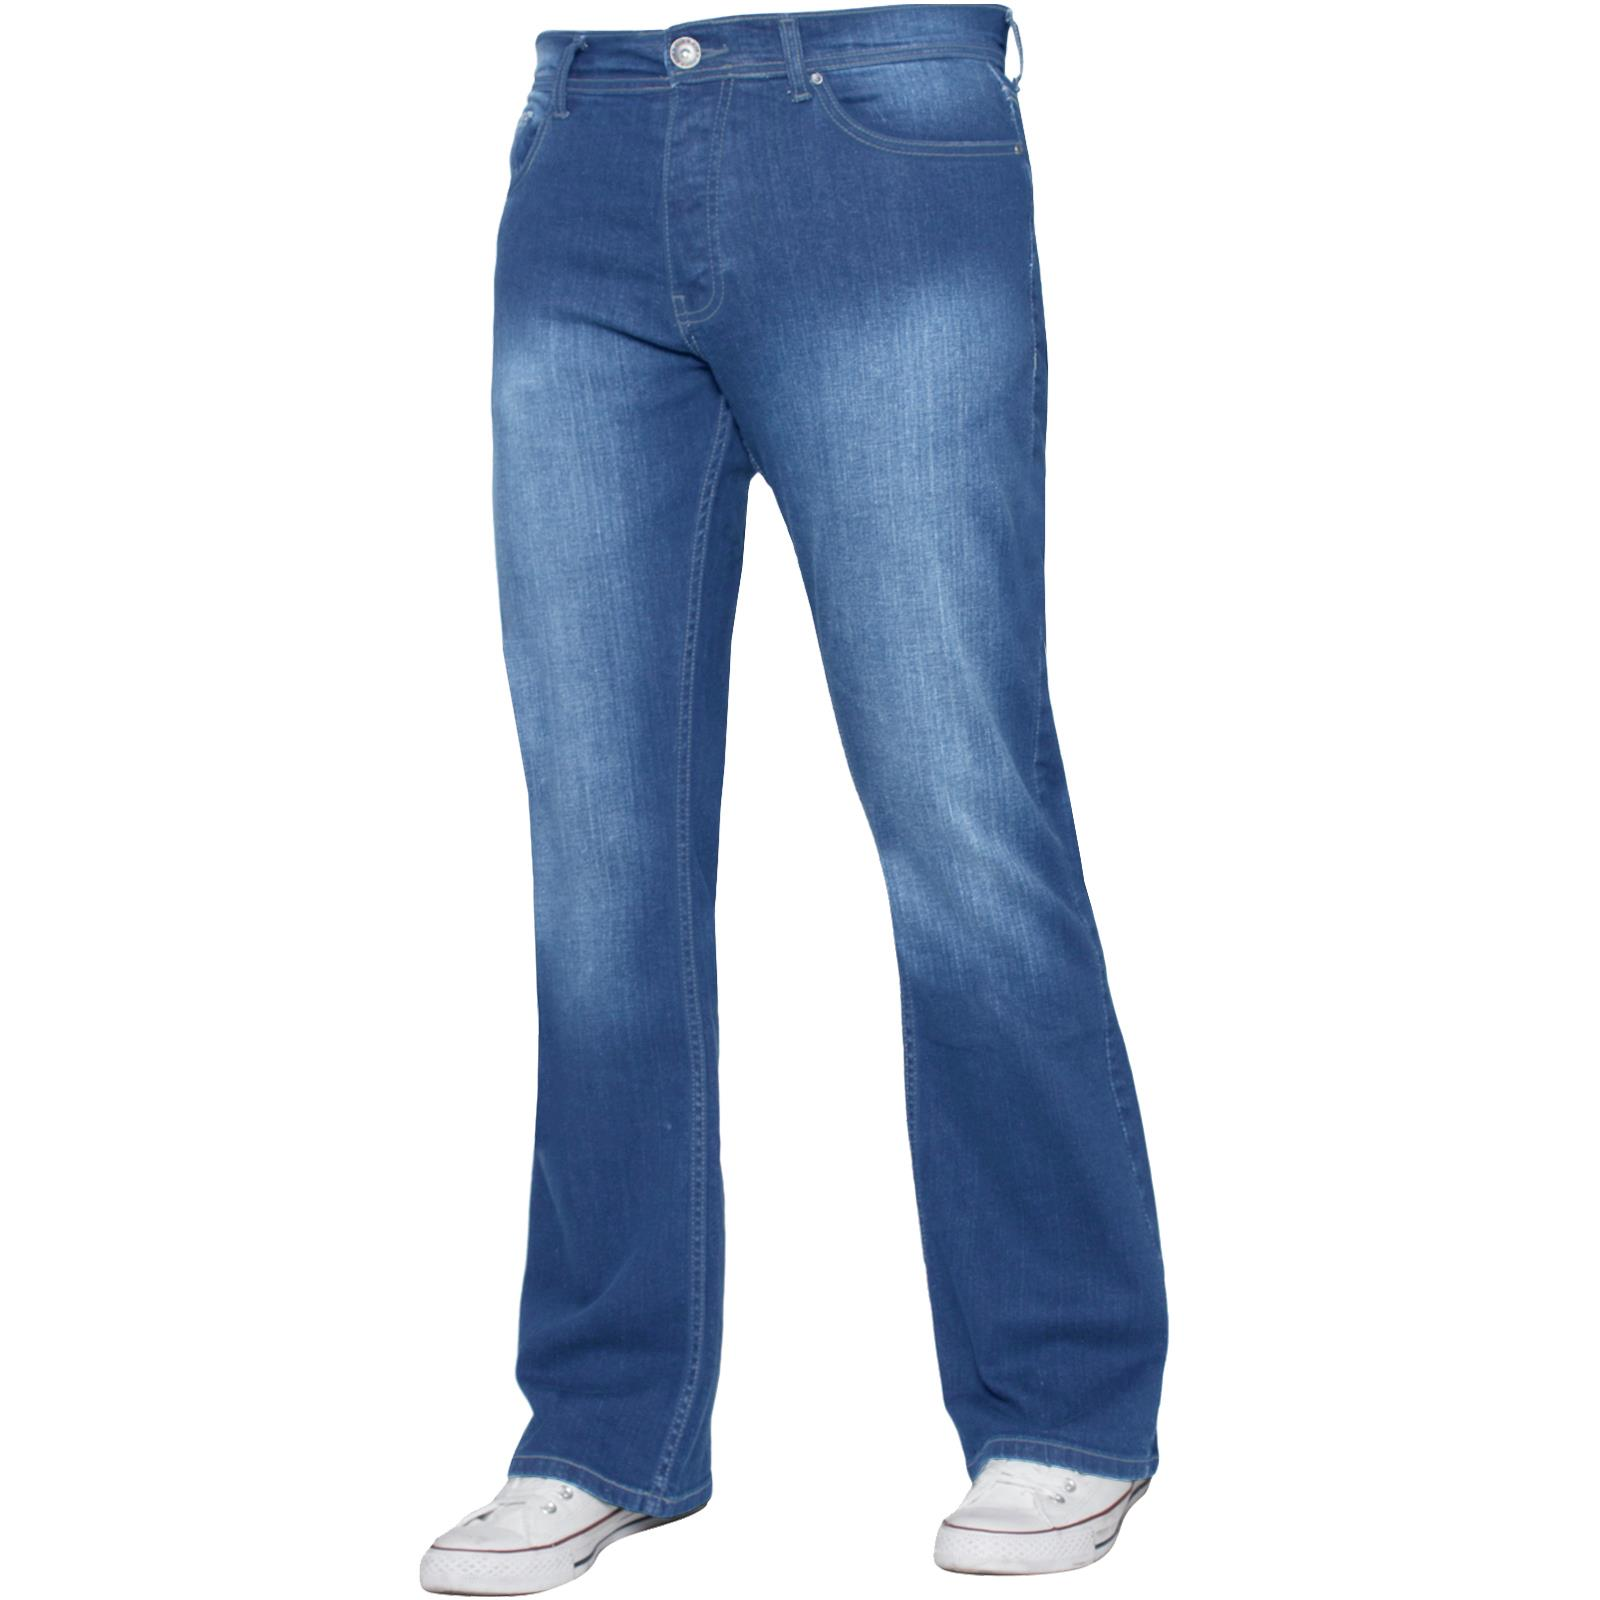 Enzo-Mens-Big-Tall-Jeans-Leg-King-Size-Denim-Pants-Chino-Trousers-Pants-44-034-60-034 thumbnail 108